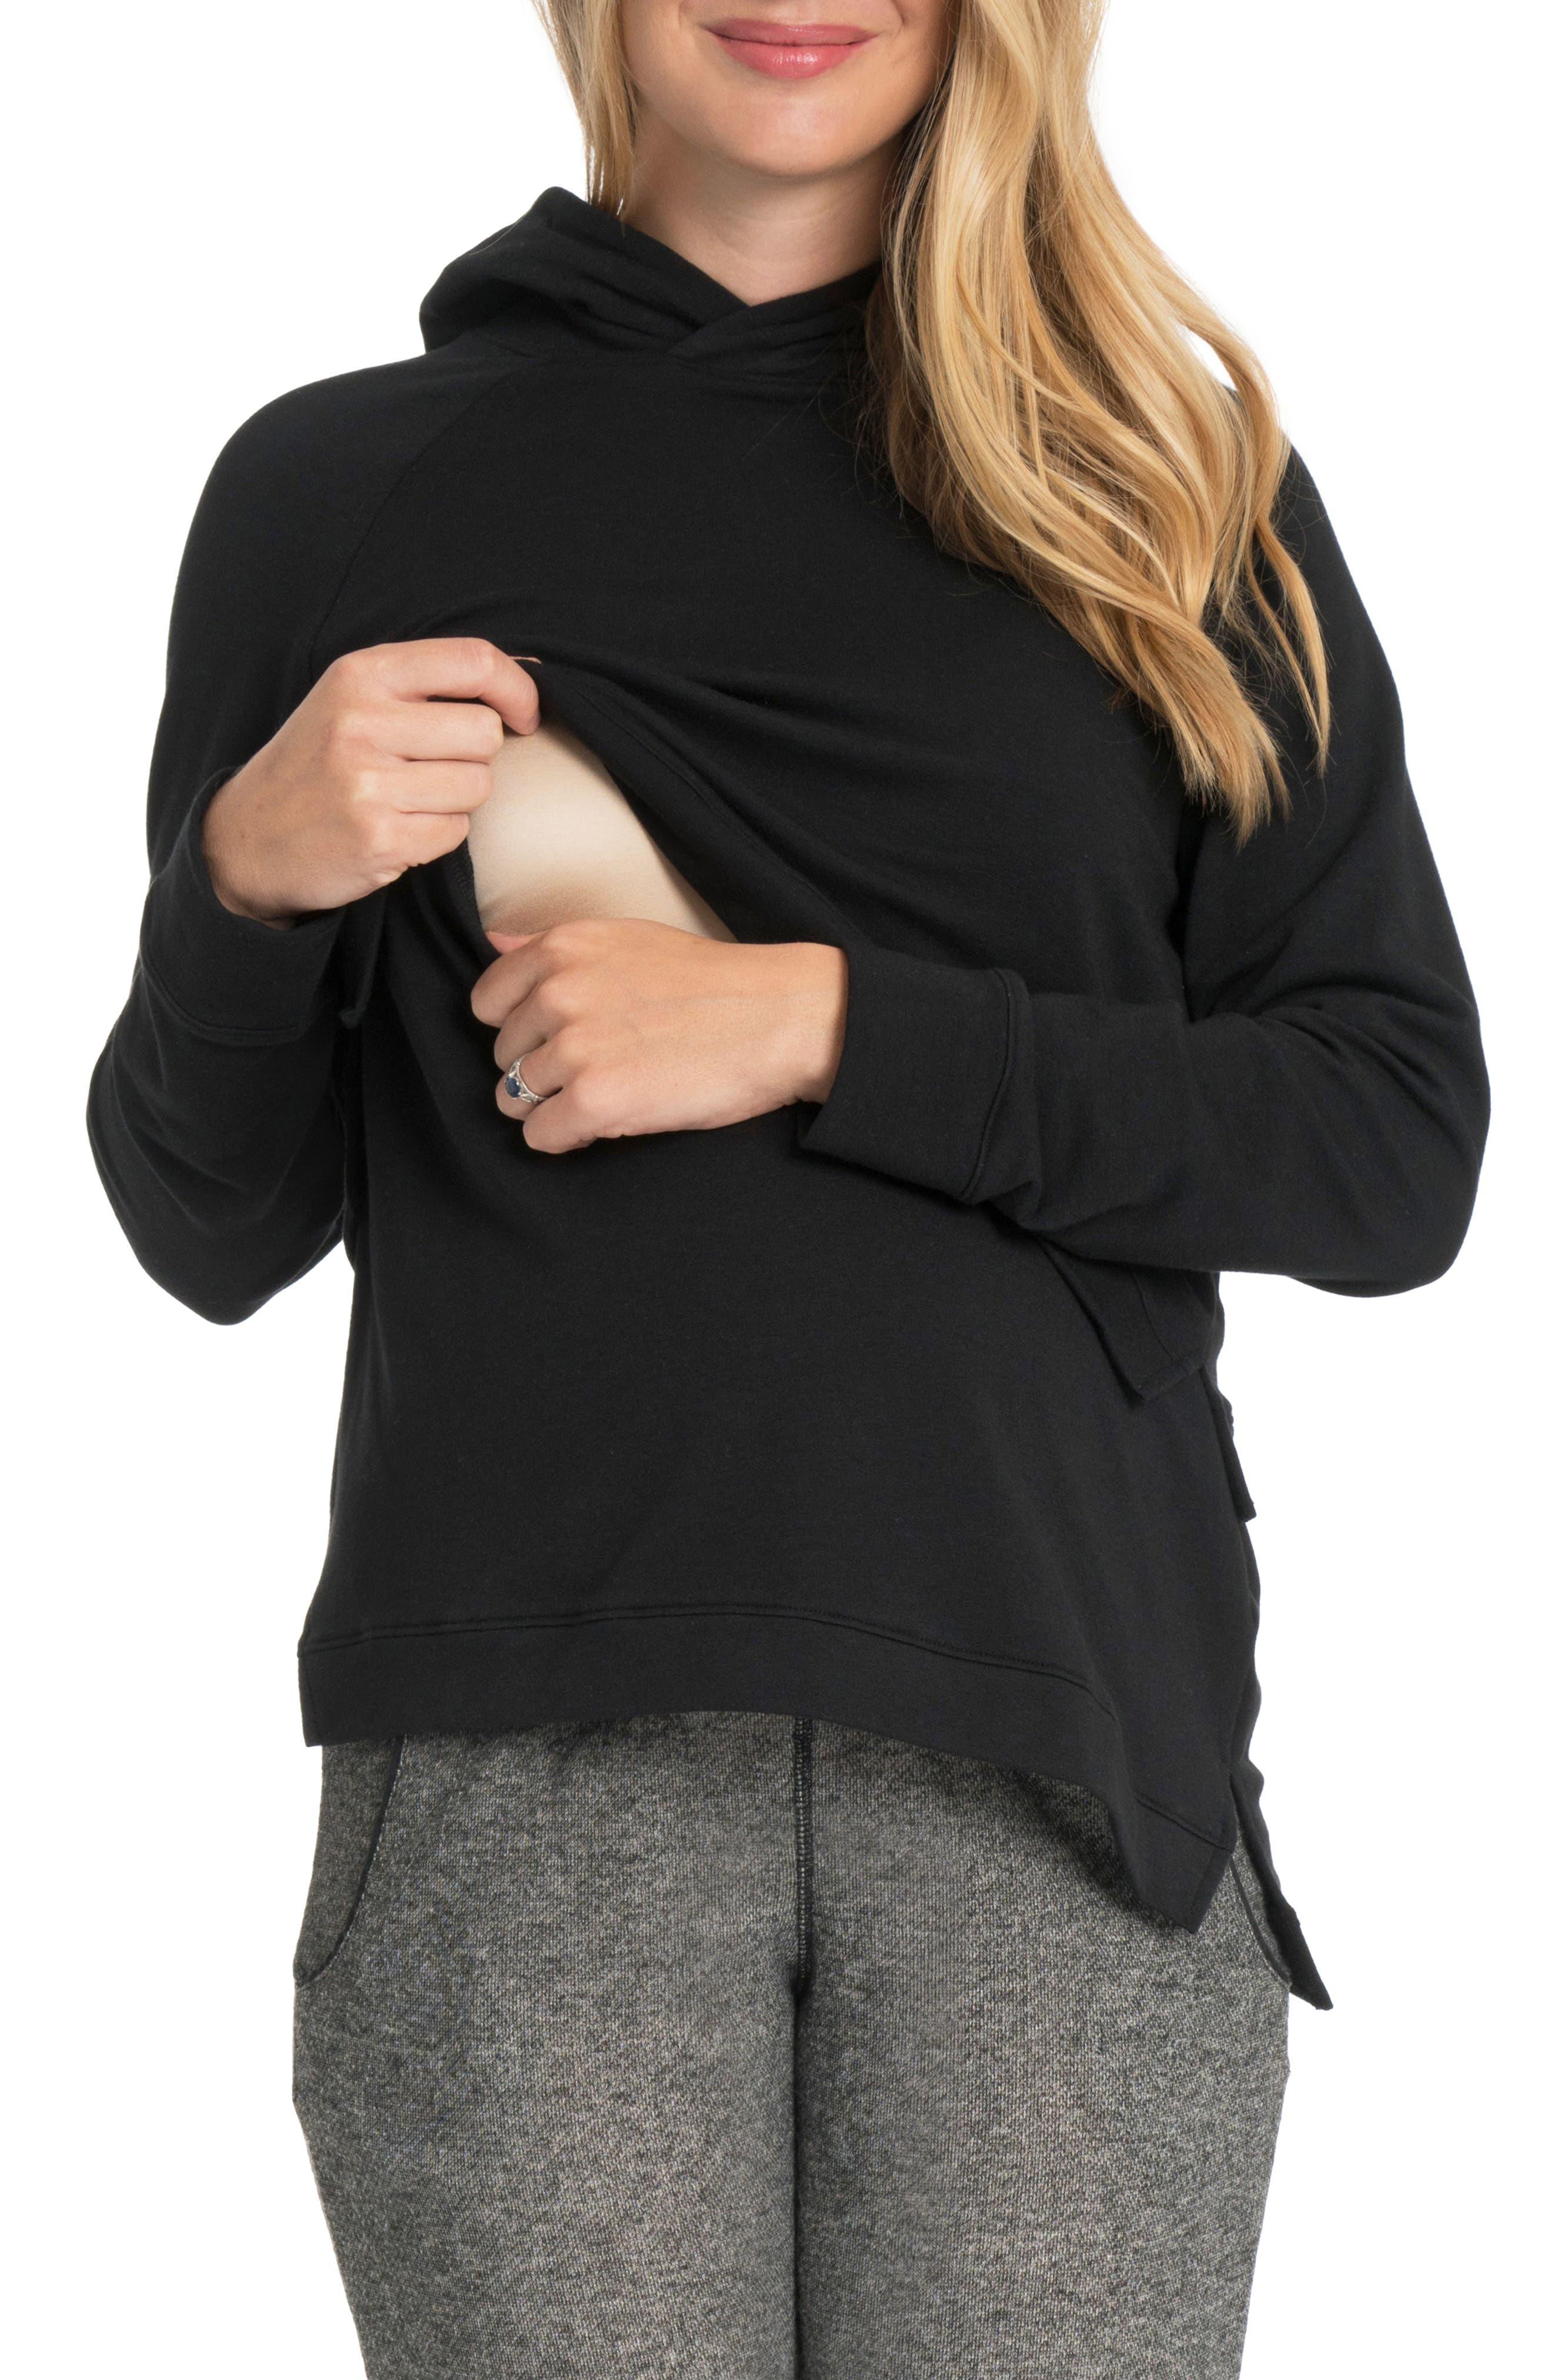 Bun Maternity Asymmetric Maternity/nursing Hoodie